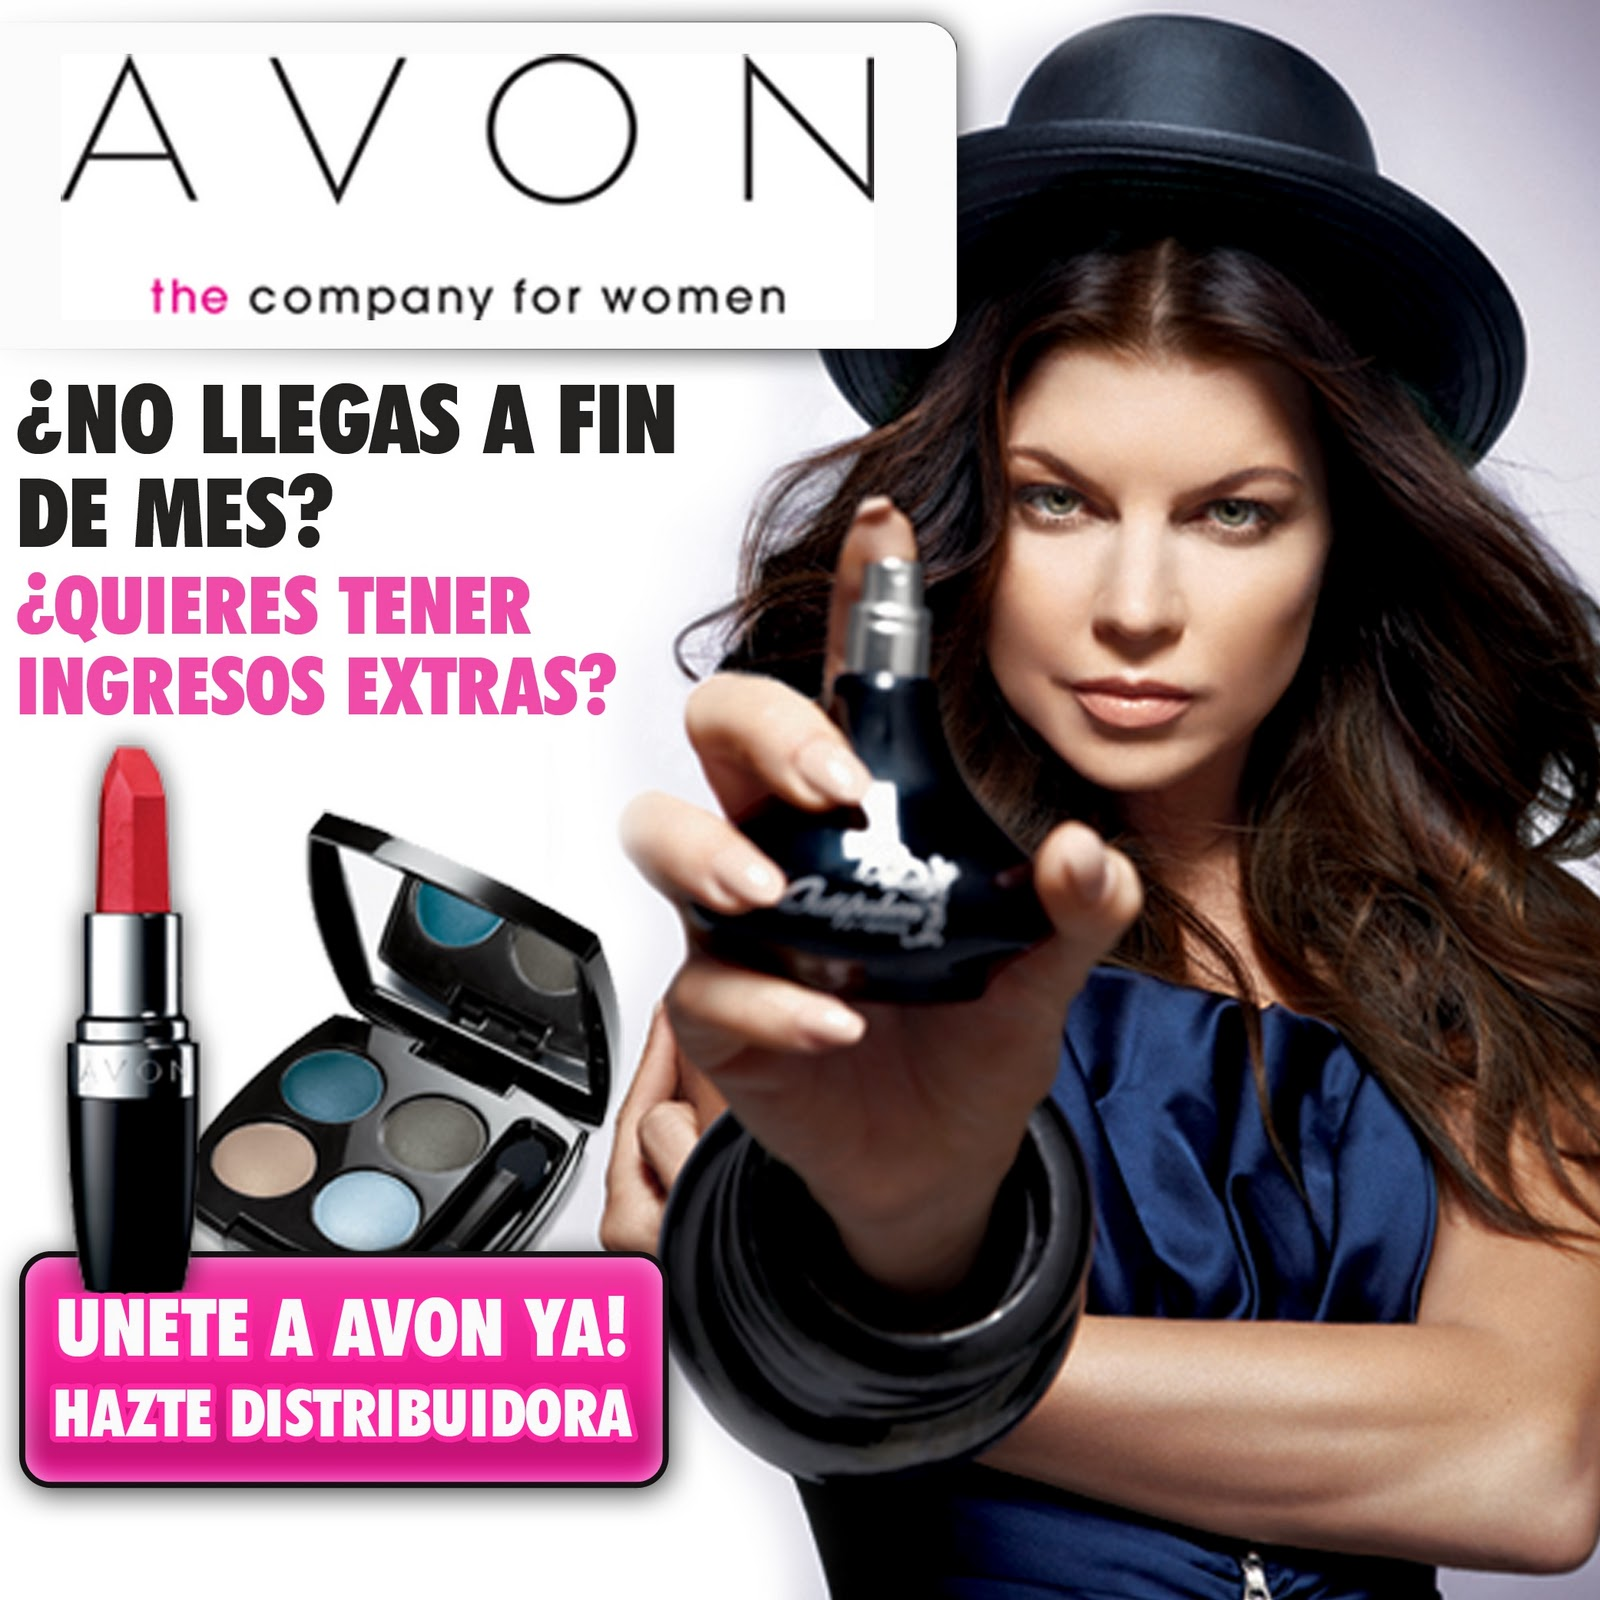 http://1.bp.blogspot.com/_GStDU0g3B7I/TLytRKmk68I/AAAAAAAAFmo/7qCmXLIgORQ/s1600/Creatividad+Avon_Adsmarket.JPG